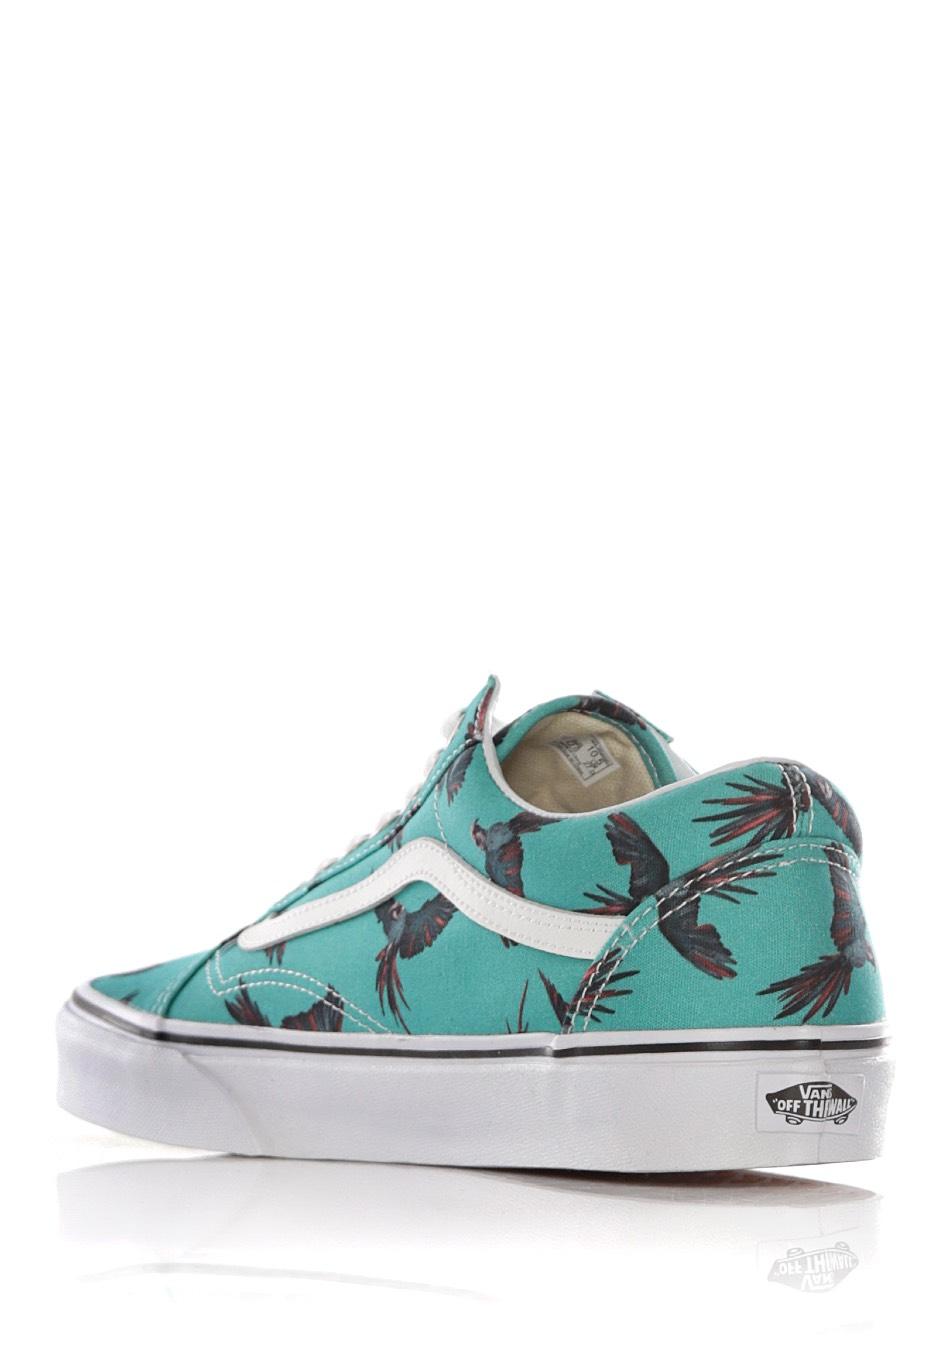 ... Vans - Old Skool Dirty Bird Turquoise True White - Girl Shoes ... 9ec9c5701